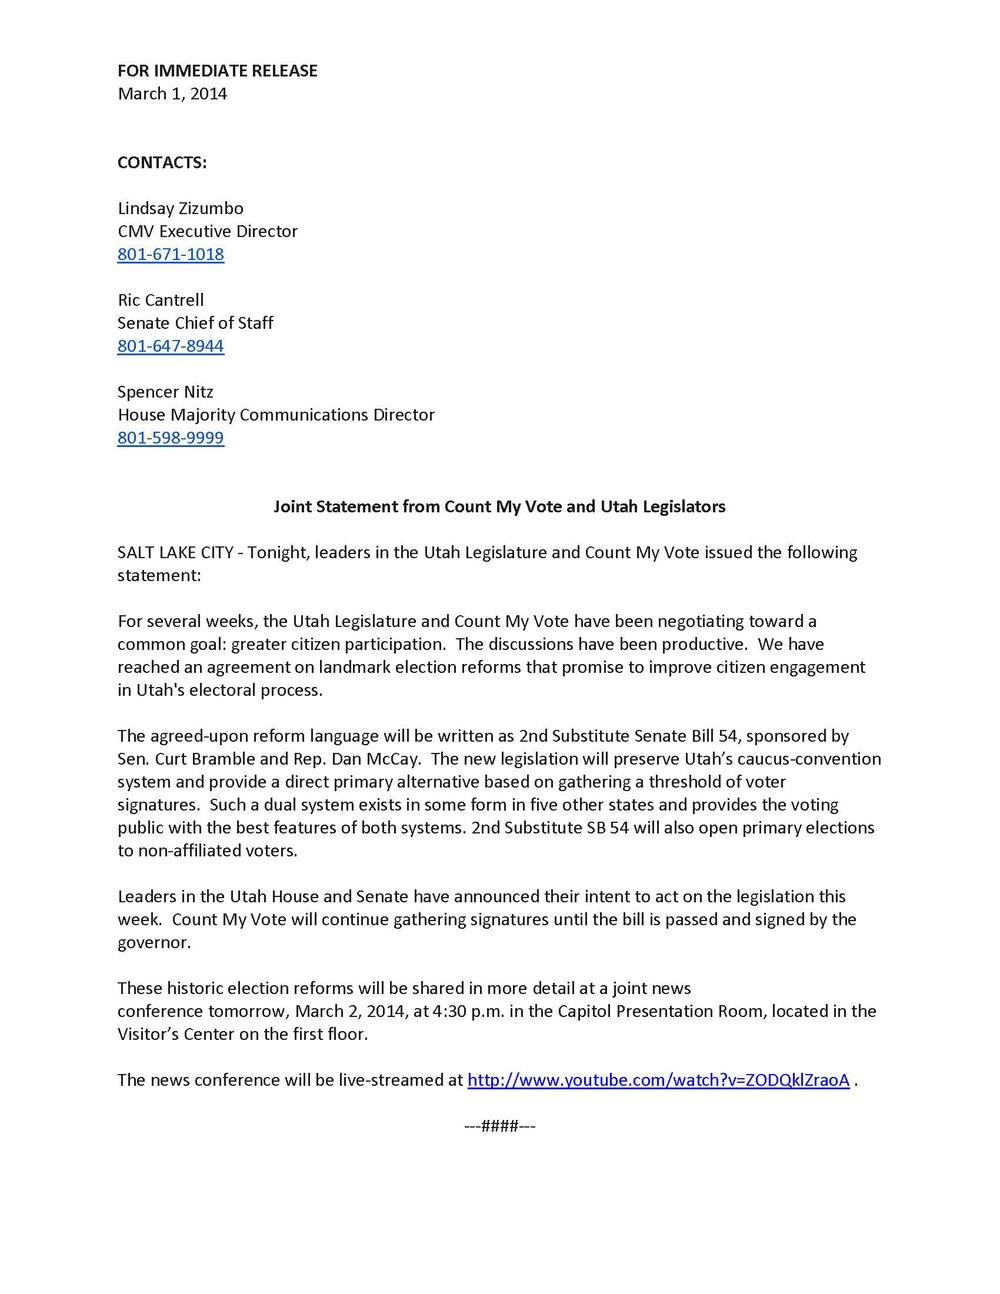 Joint Statement from Count My Vote and Utah Legislators.jpg